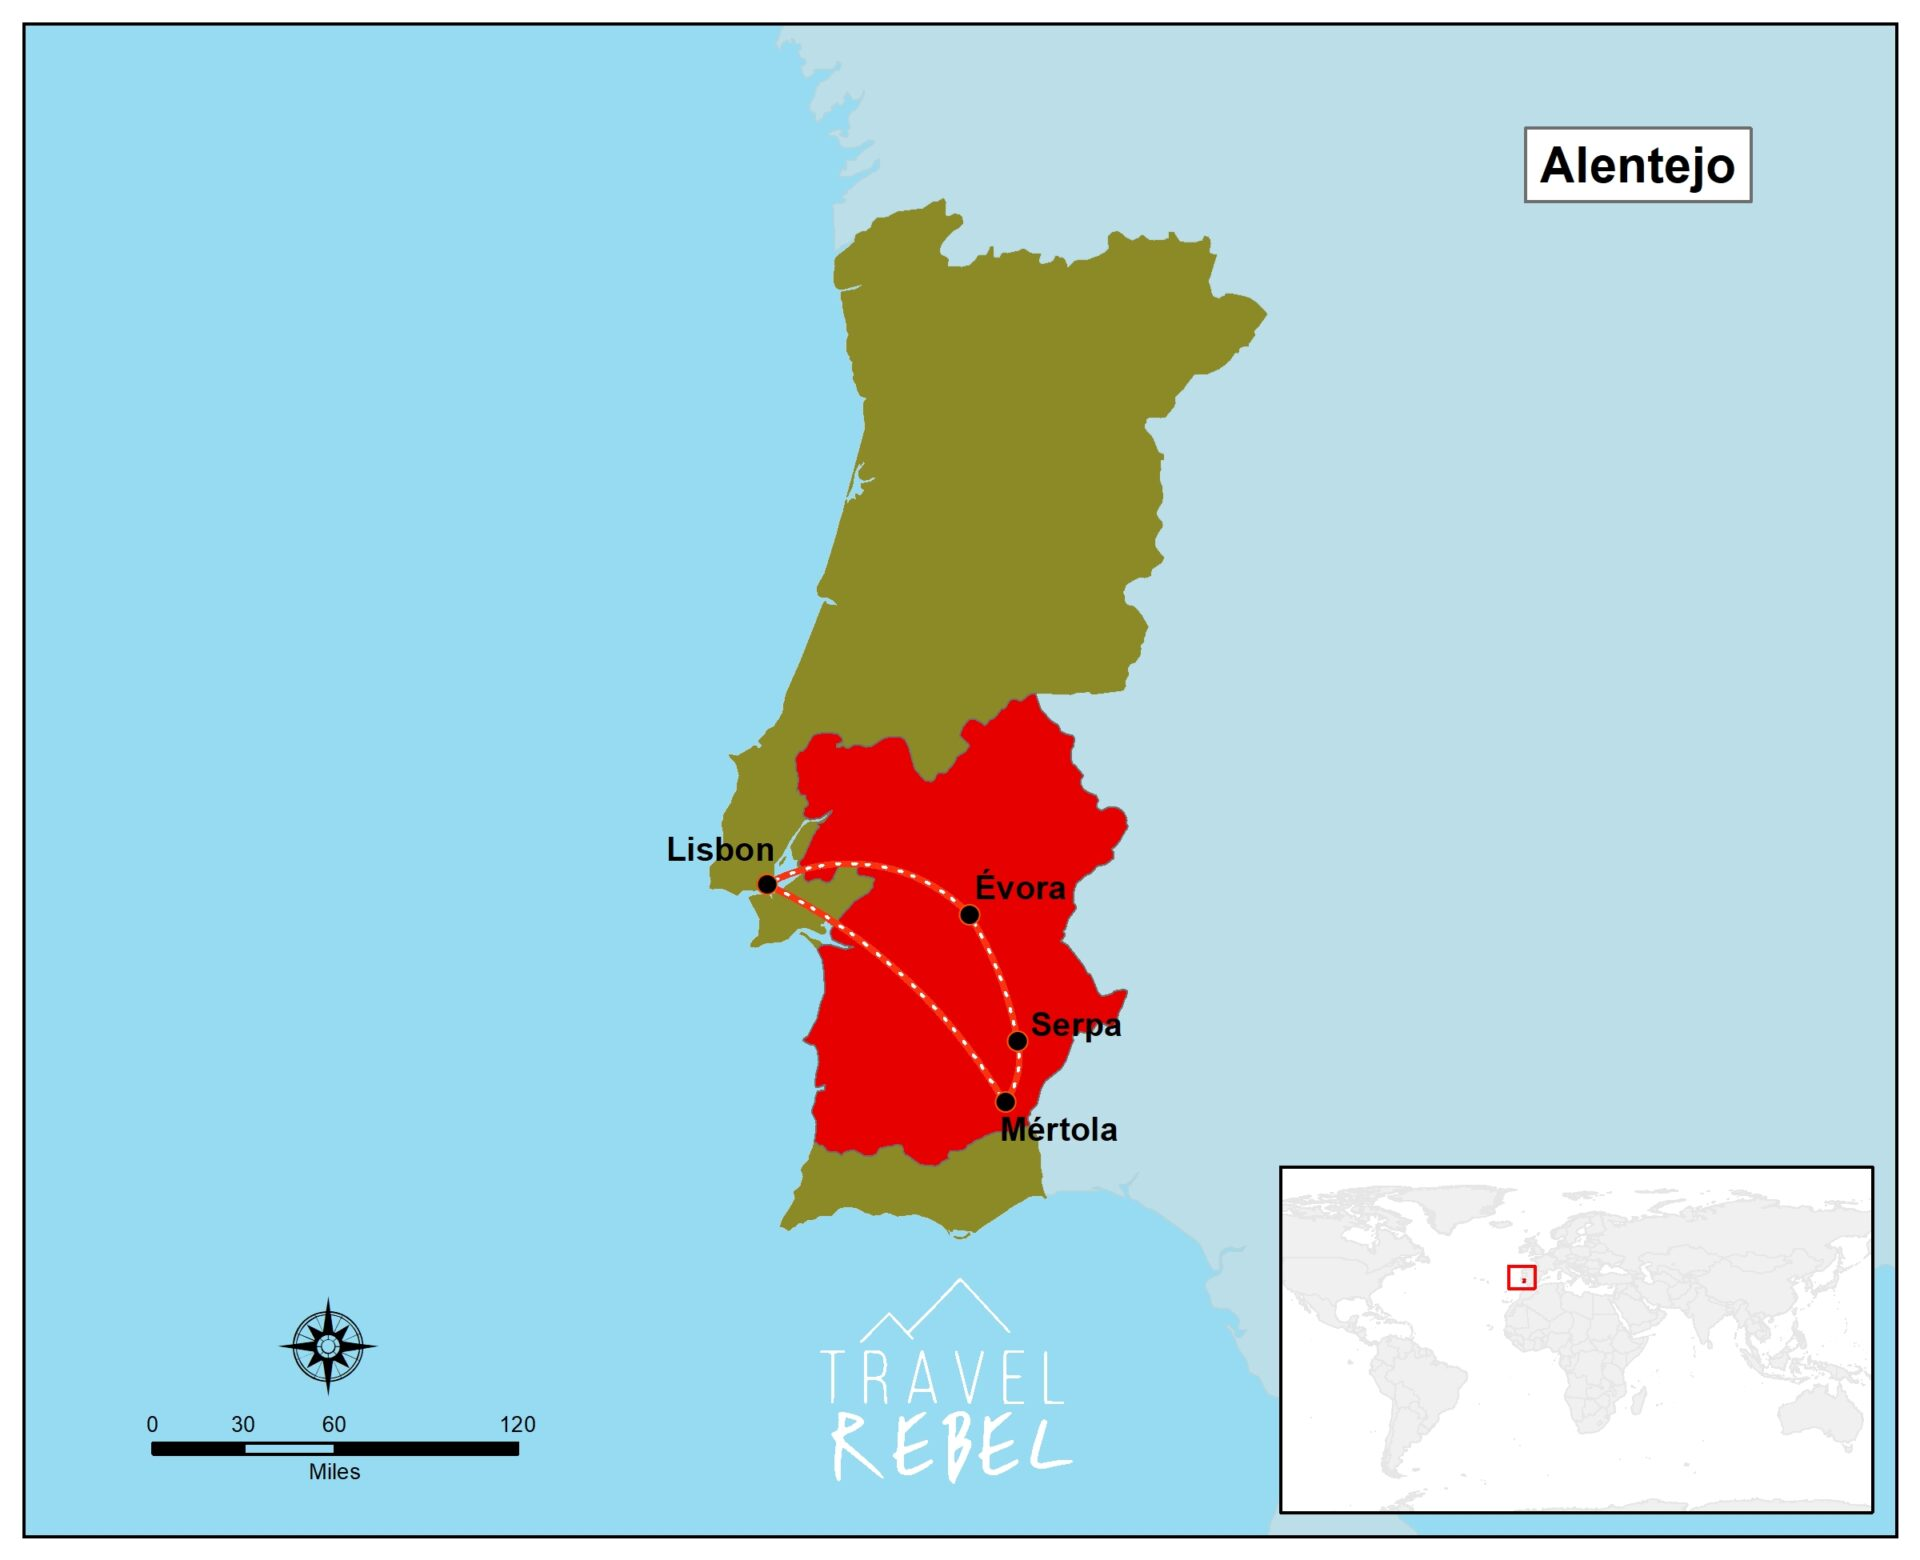 Roadtrip in Alentejo - Portugal